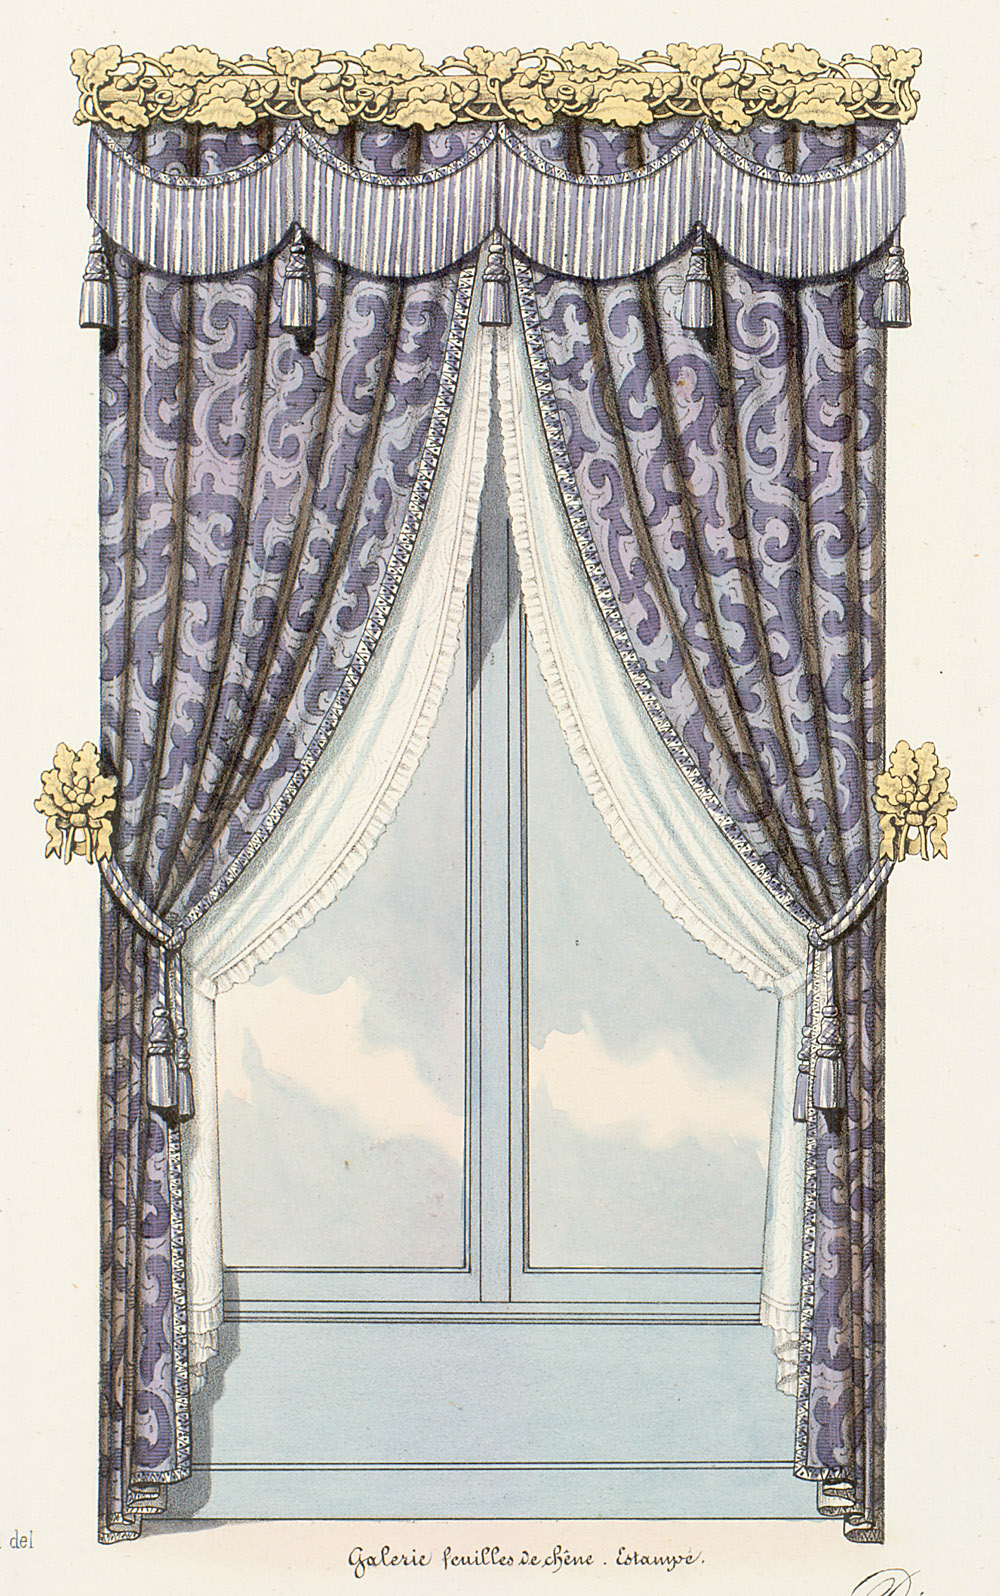 Window Treatment,  Image number:SIL12-2-356b